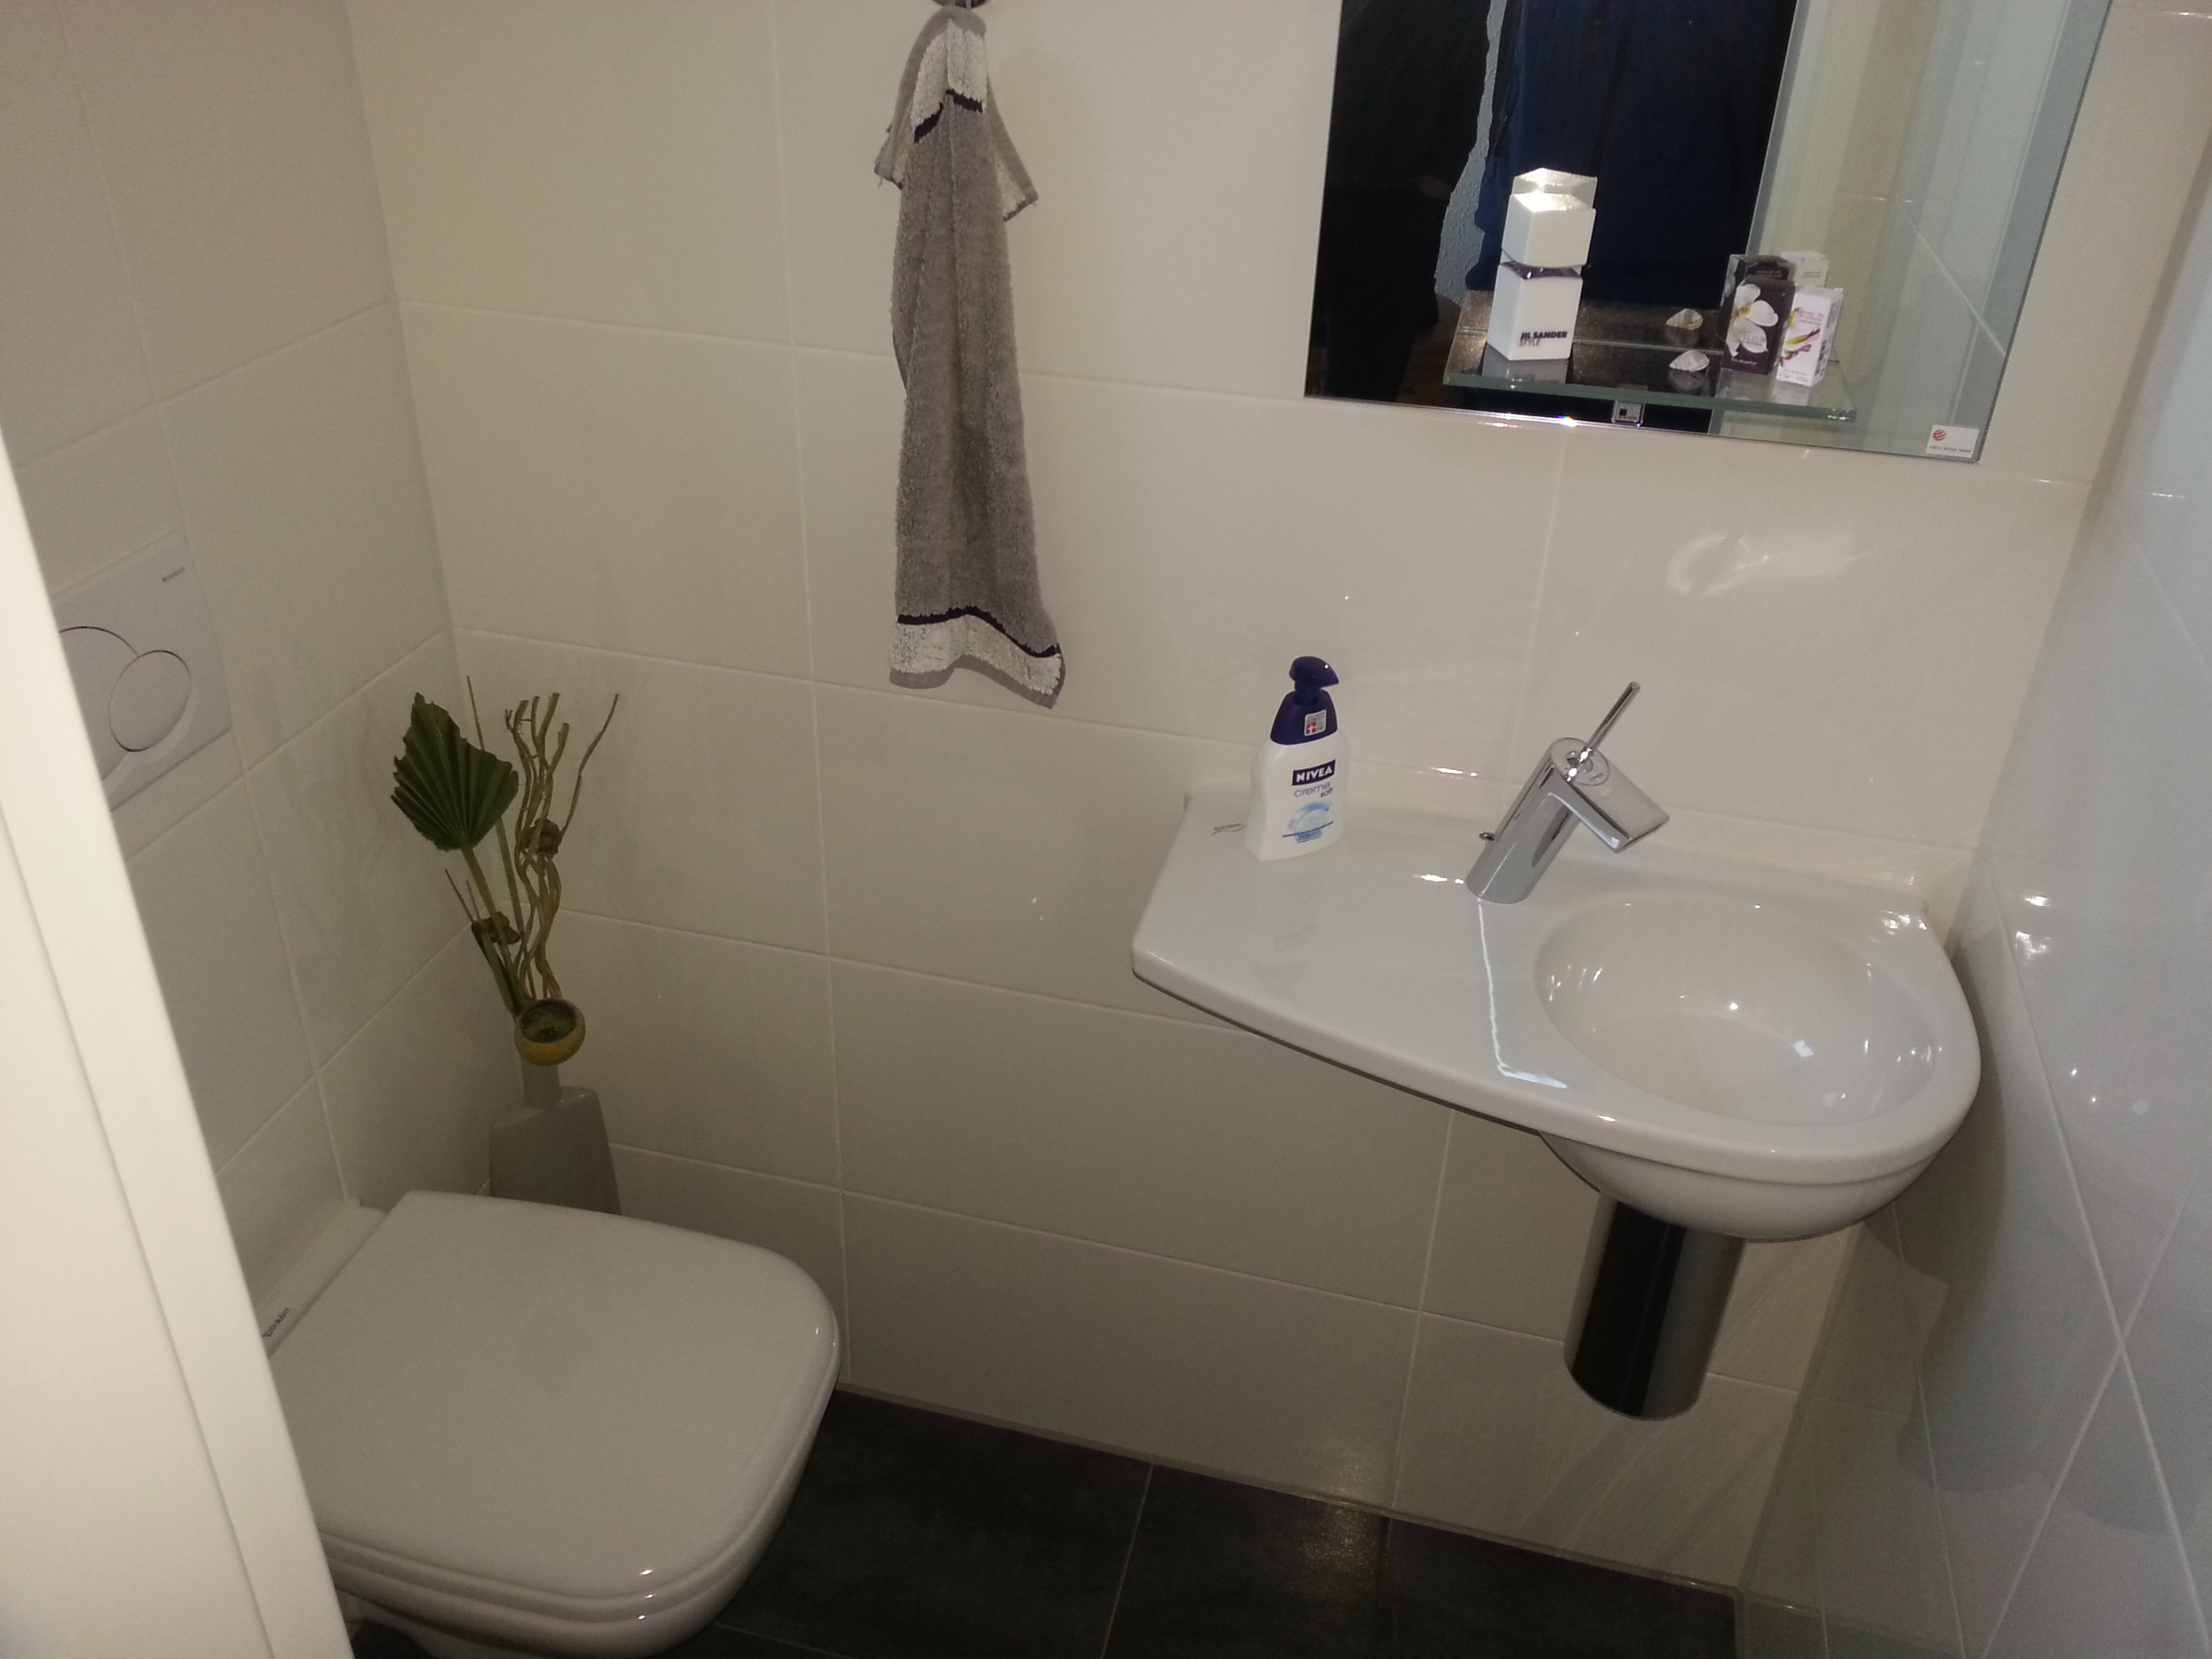 Gerd Nolte Heizung & Sanitär – Badezimmer Terrakotta – Große Duschkabine